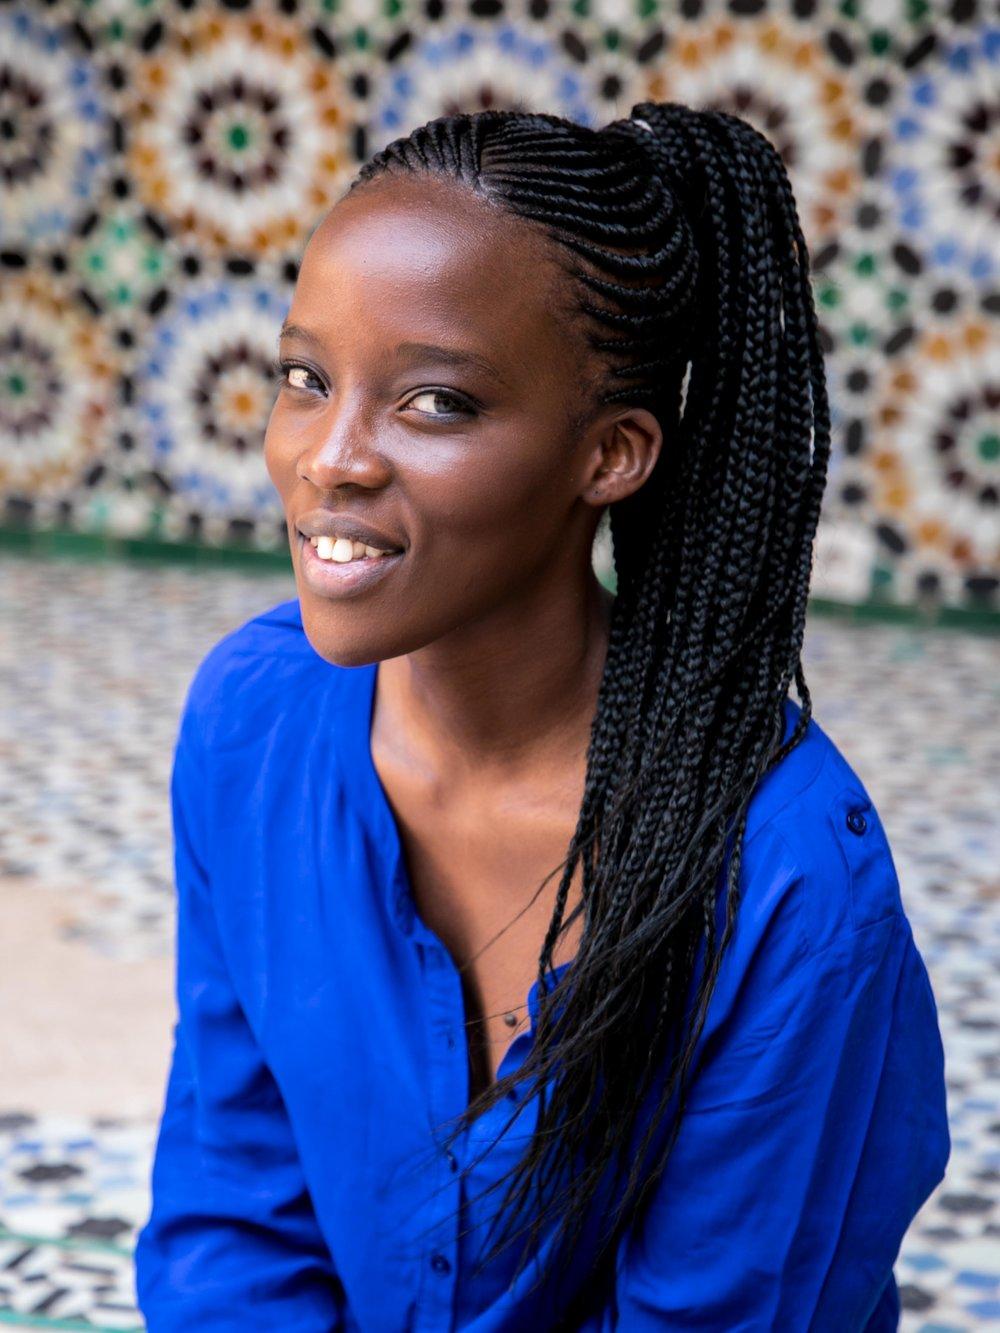 Myriam - @myriamneza  attended #honeysinmarrakech '17